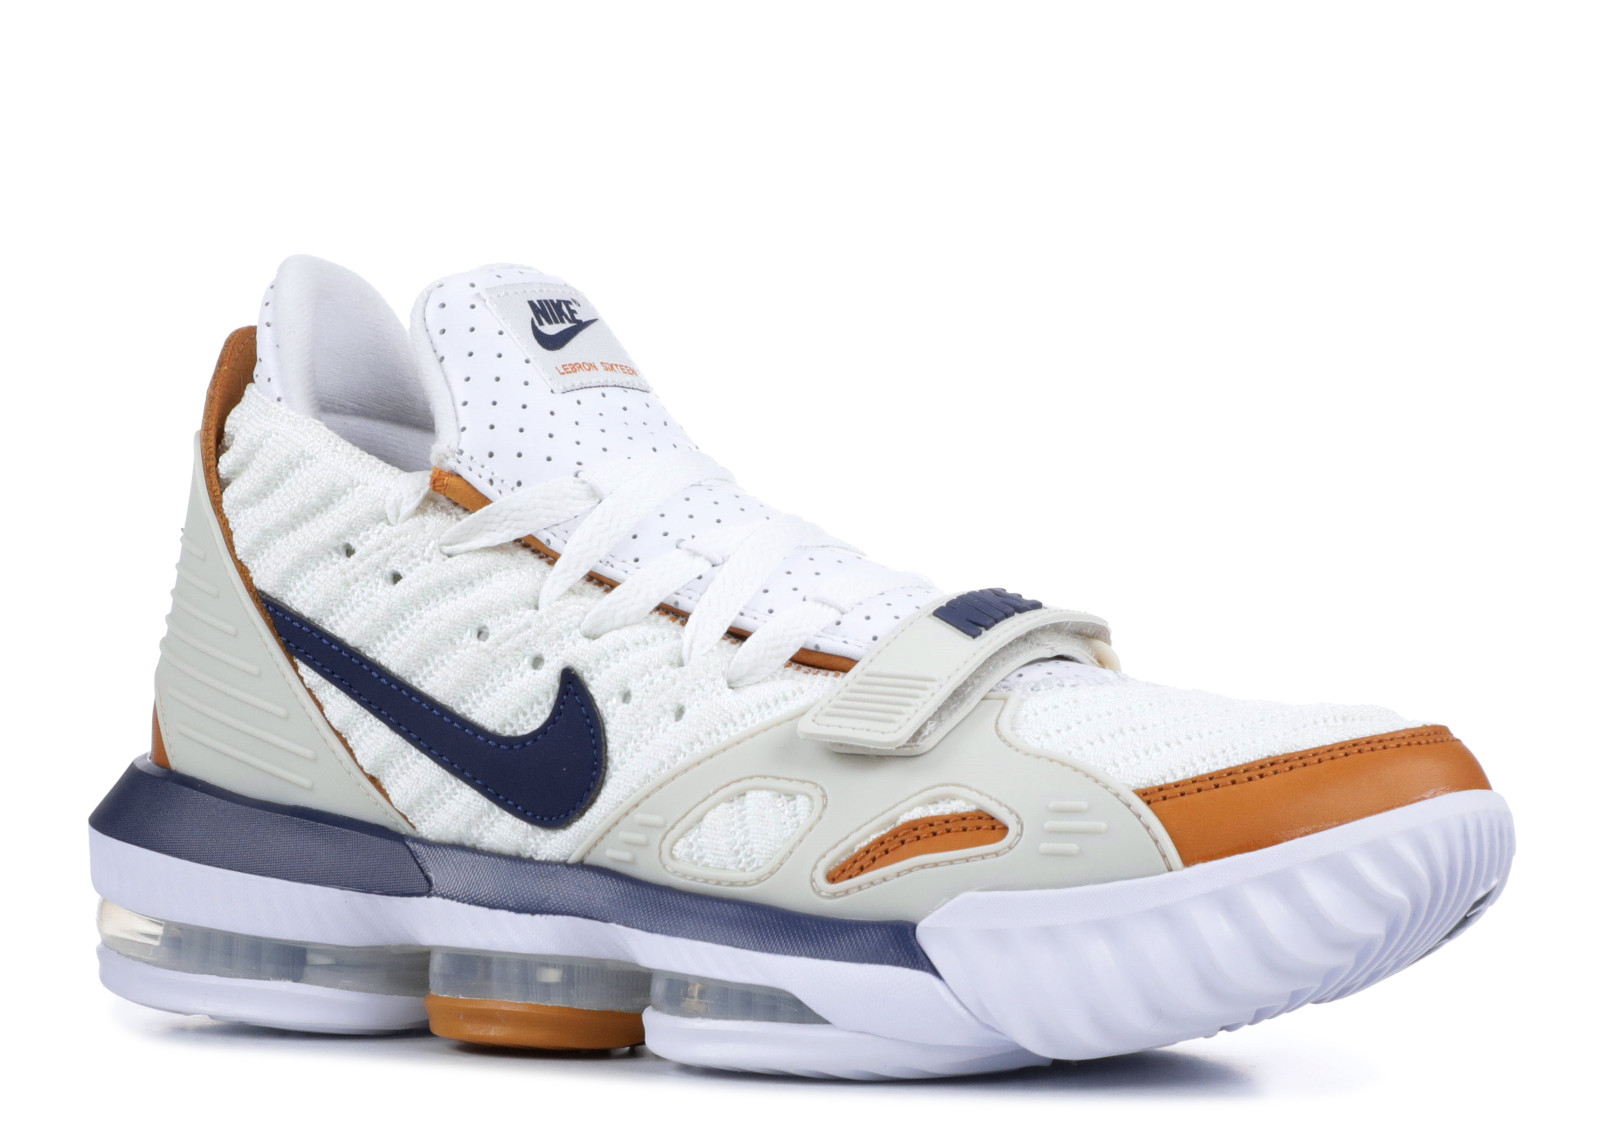 Nike - Men - Nike Lebron 16 'Medicine